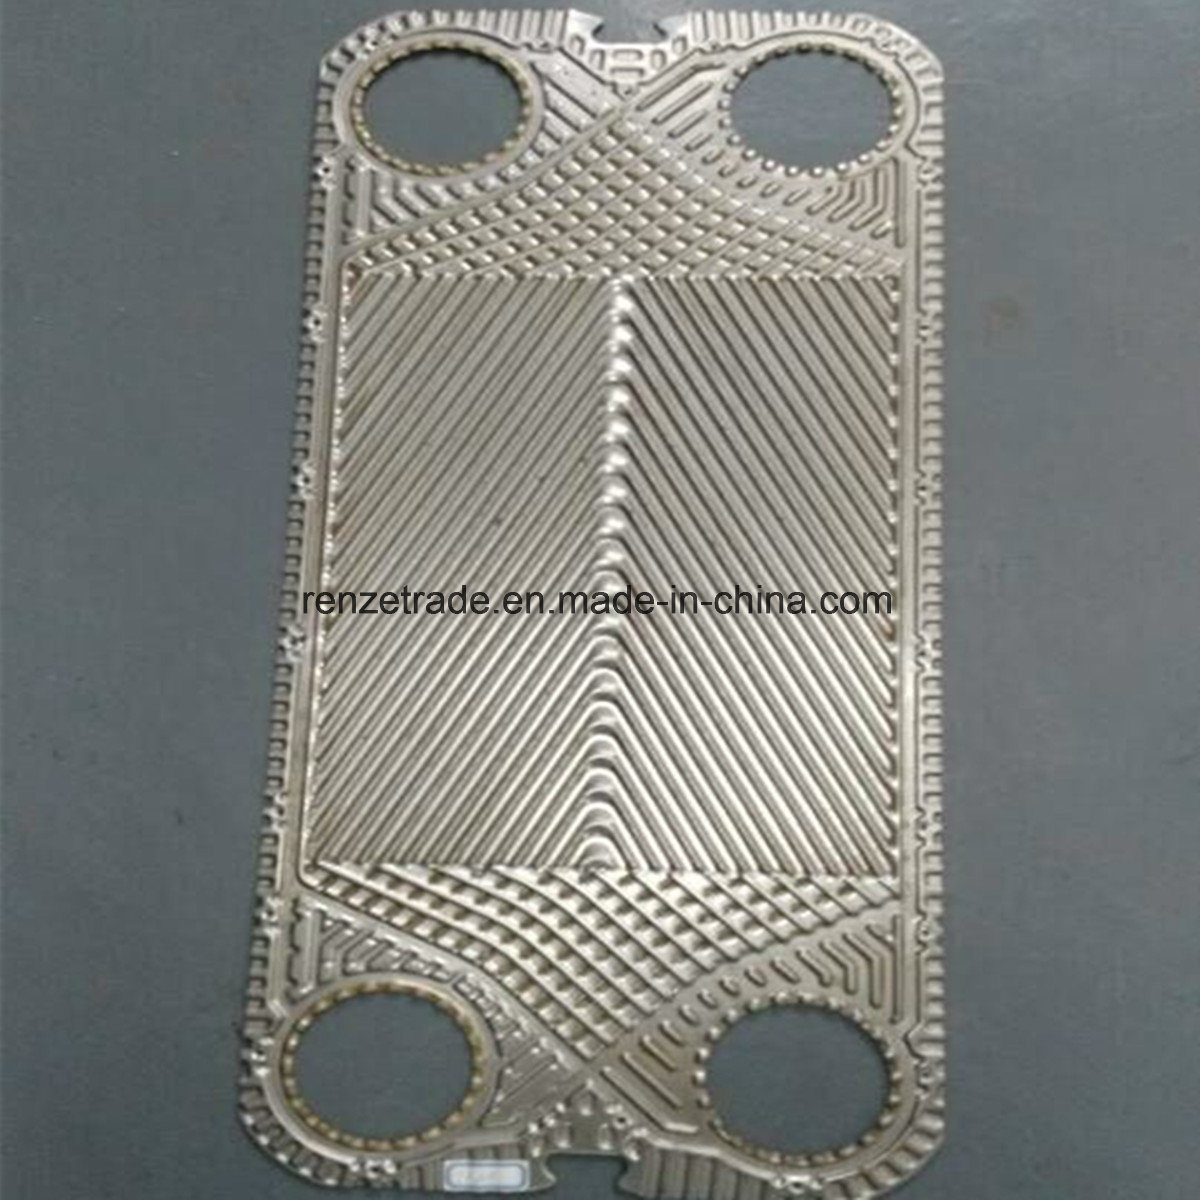 Titanium, Hastelloy High Temperature Resistance Plate for Alfa Laval Equivalent Plate